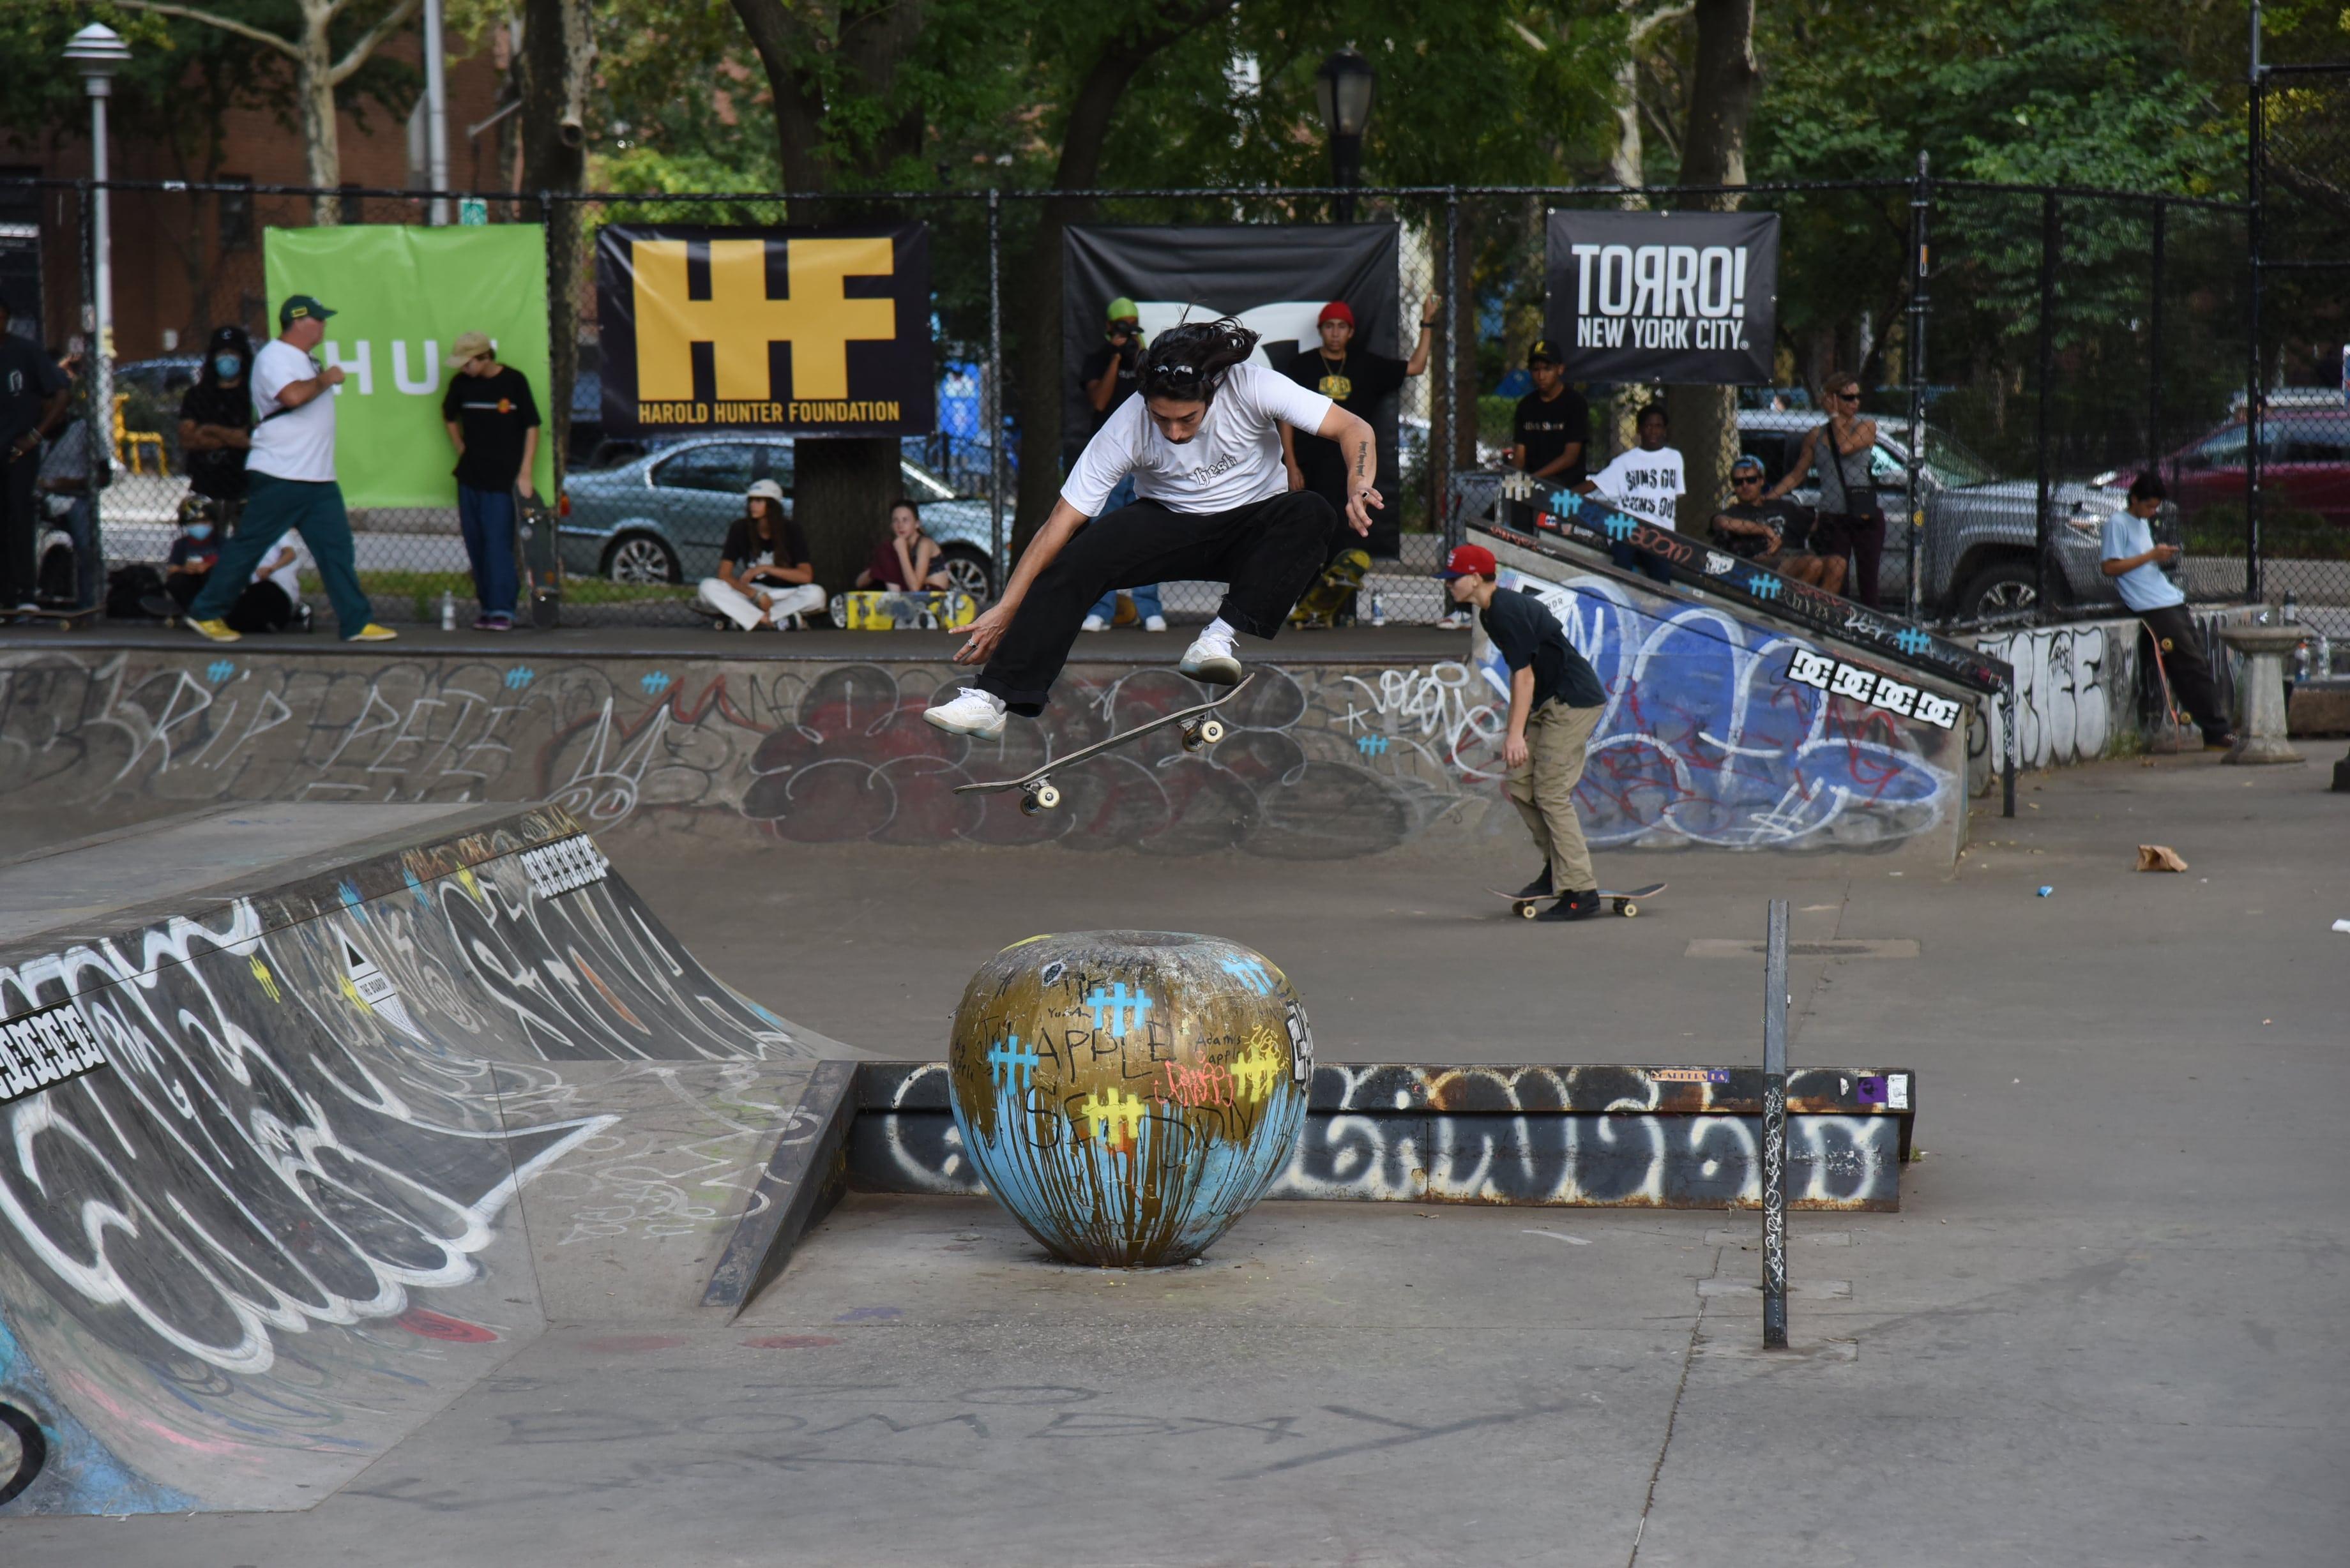 The Boardr Open - Emilio Dufour Frontside Flip